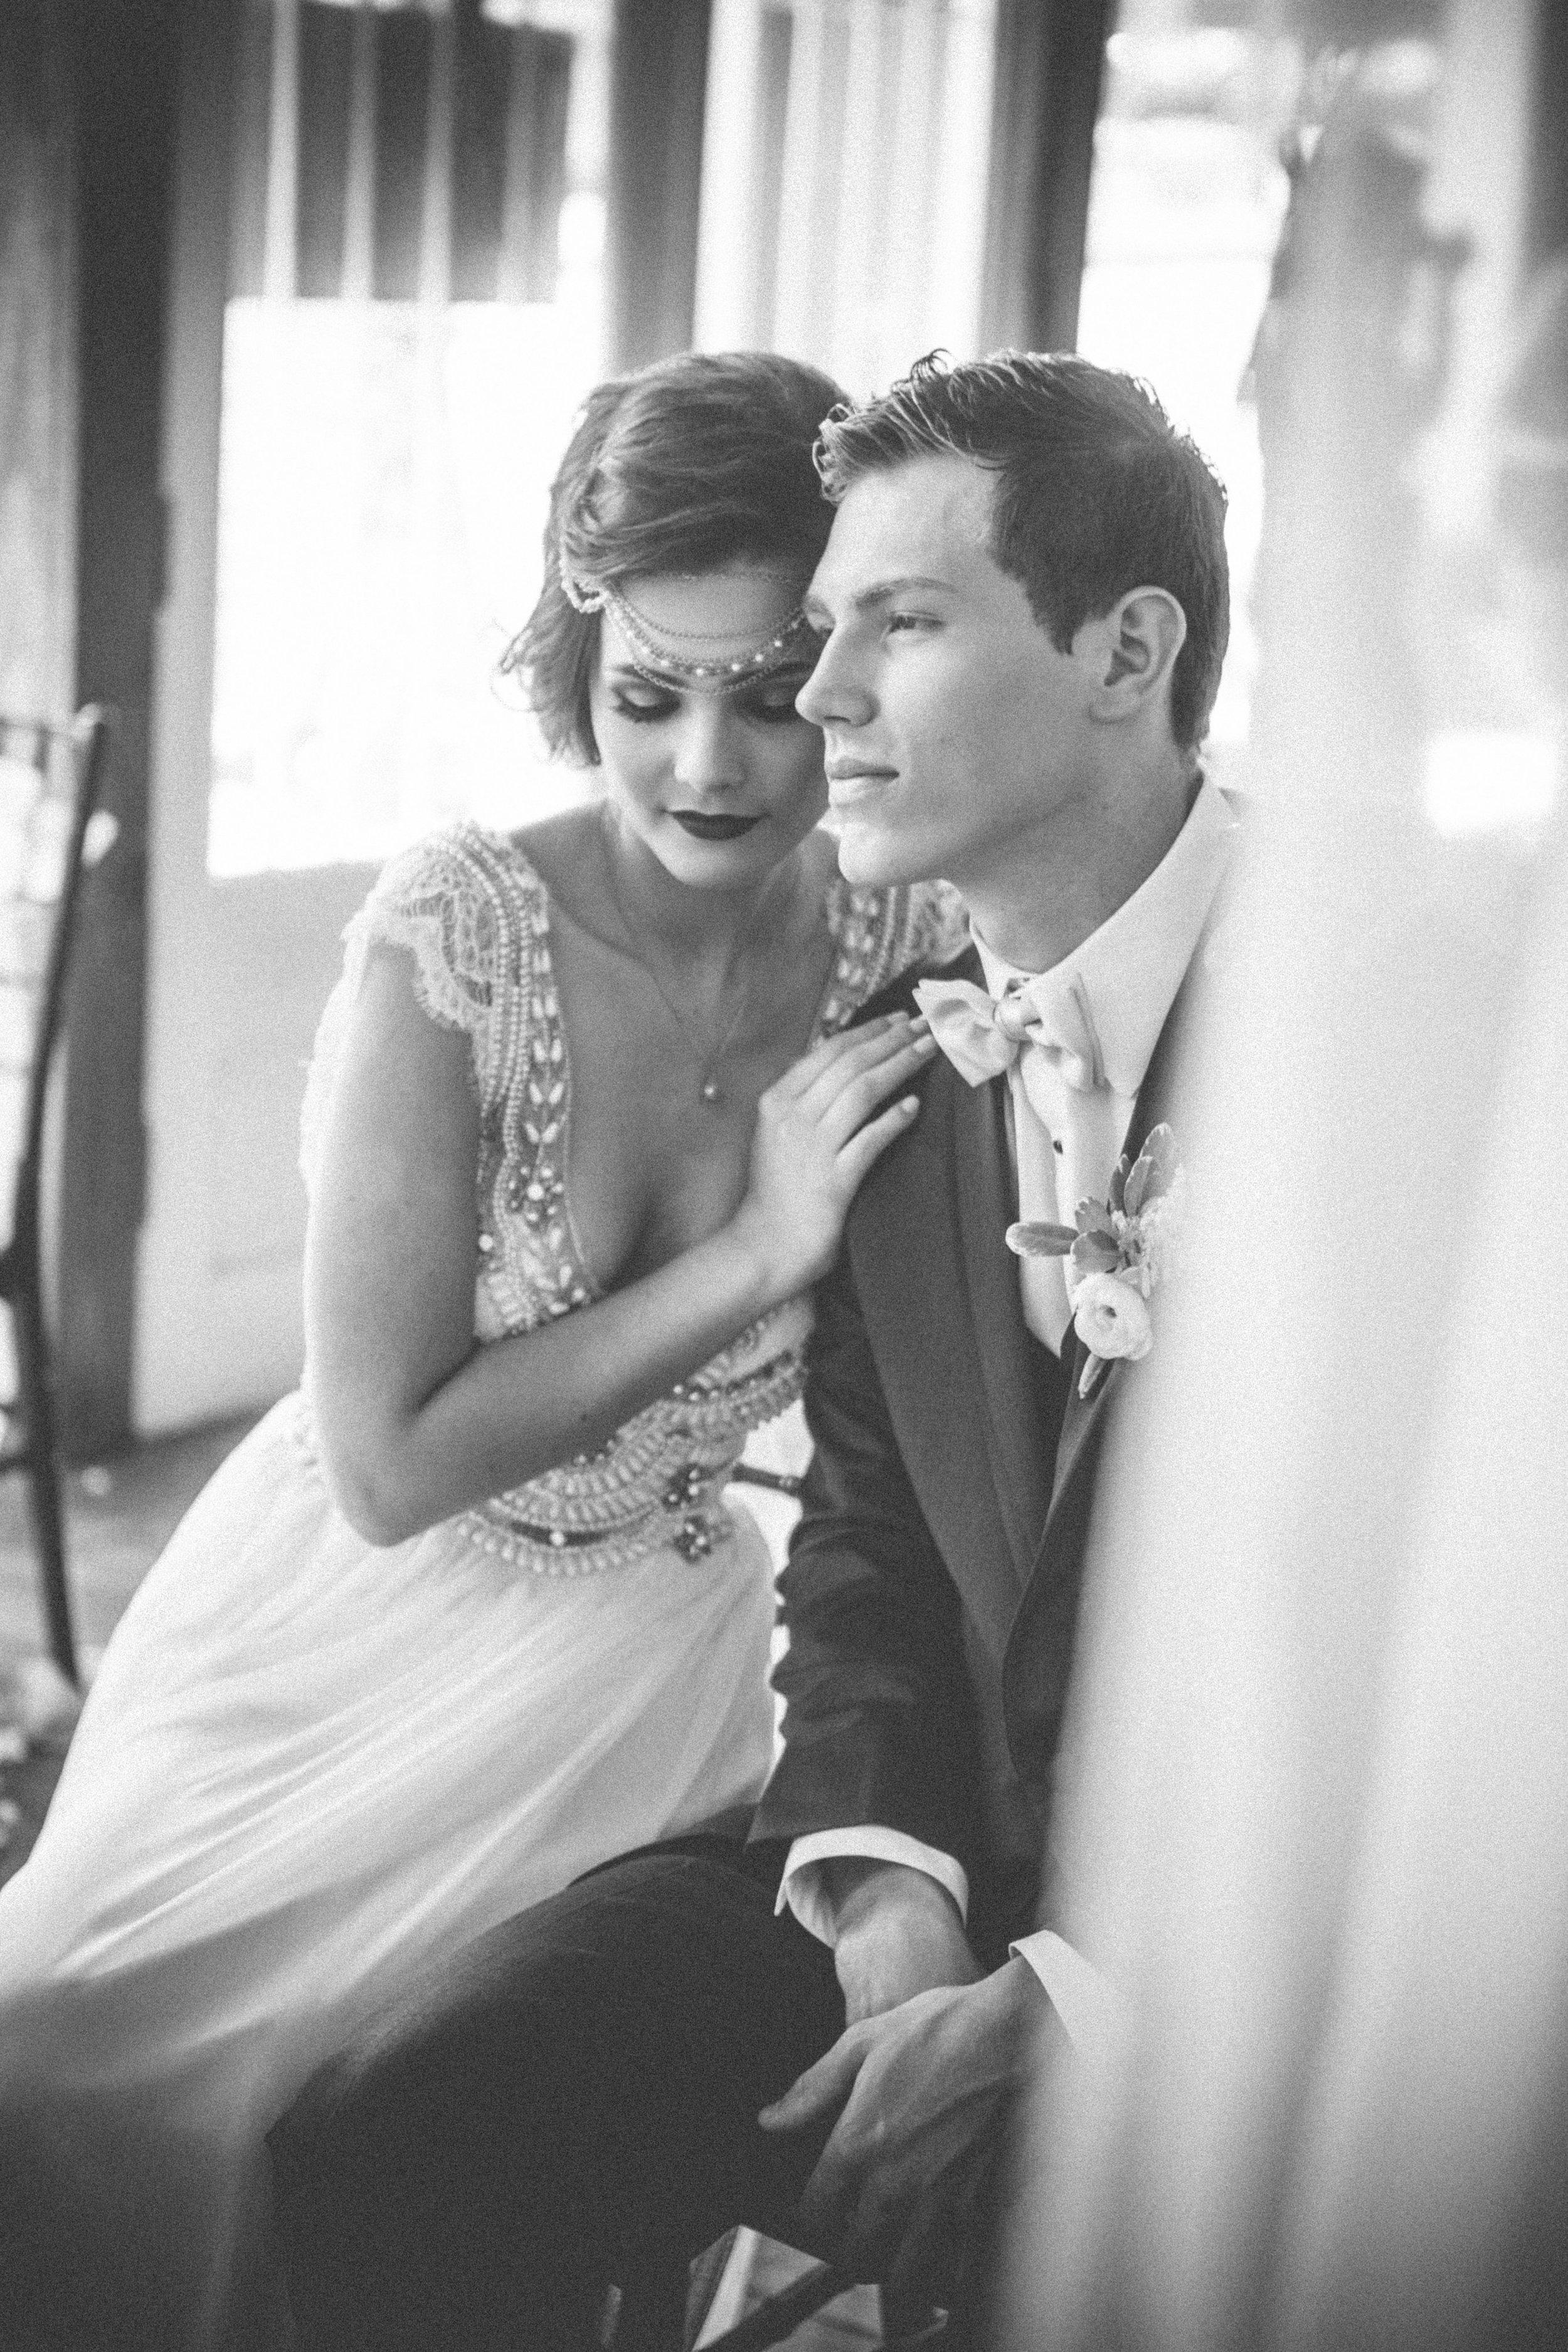 anna-campbell-coco-christa-o'brien-photography-the-corner-district-wedding-atlanta-wedding-savannah-bridal-boutique-ivory-and-beau-bridal-boutique-savannah-bridal-gowns-savannah-bridal-atlanta-bridal-boutique-borrowed-and-blue-4.jpg